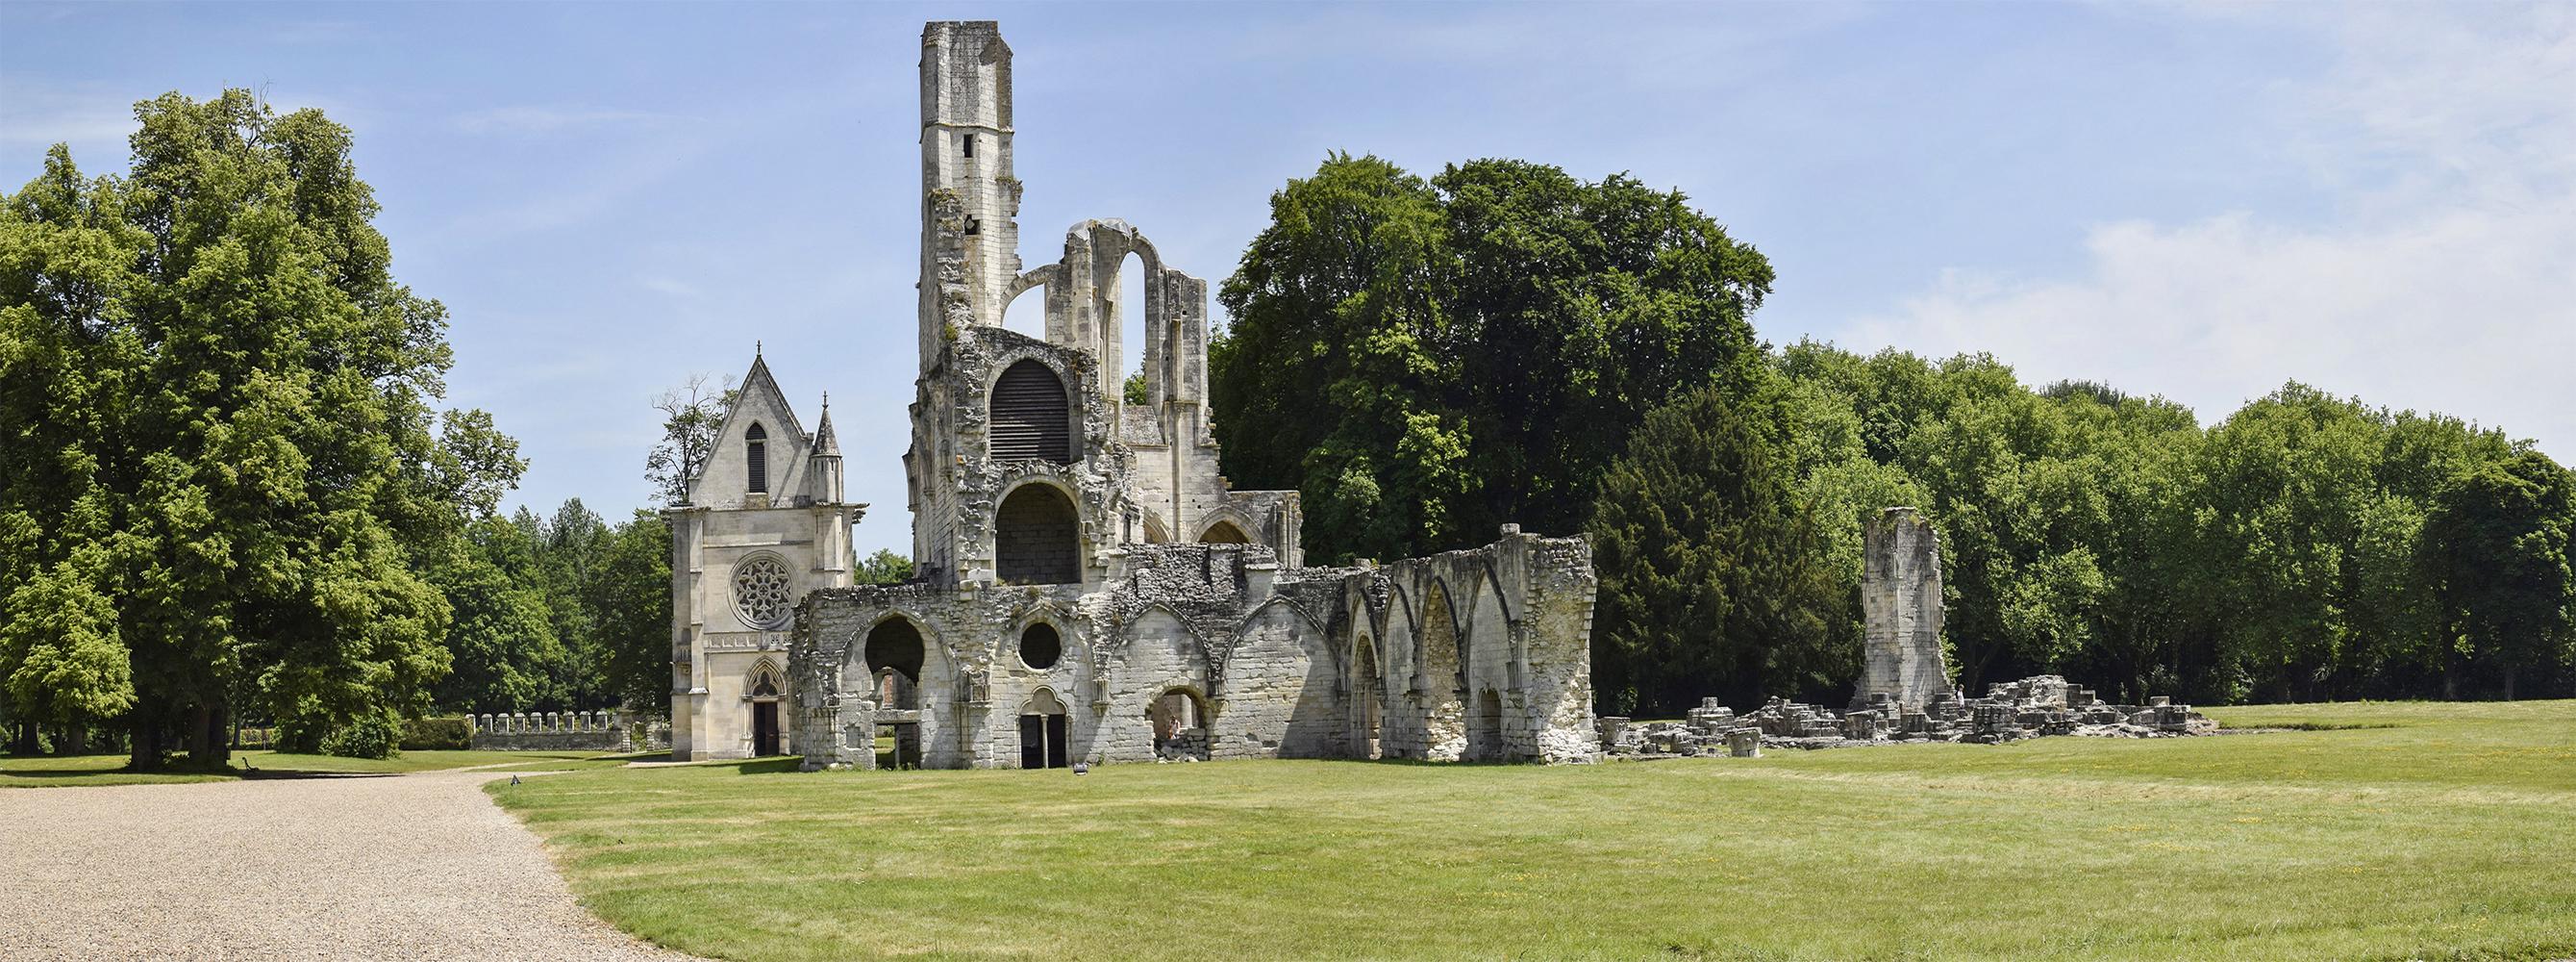 01 abbaye de Chaalis